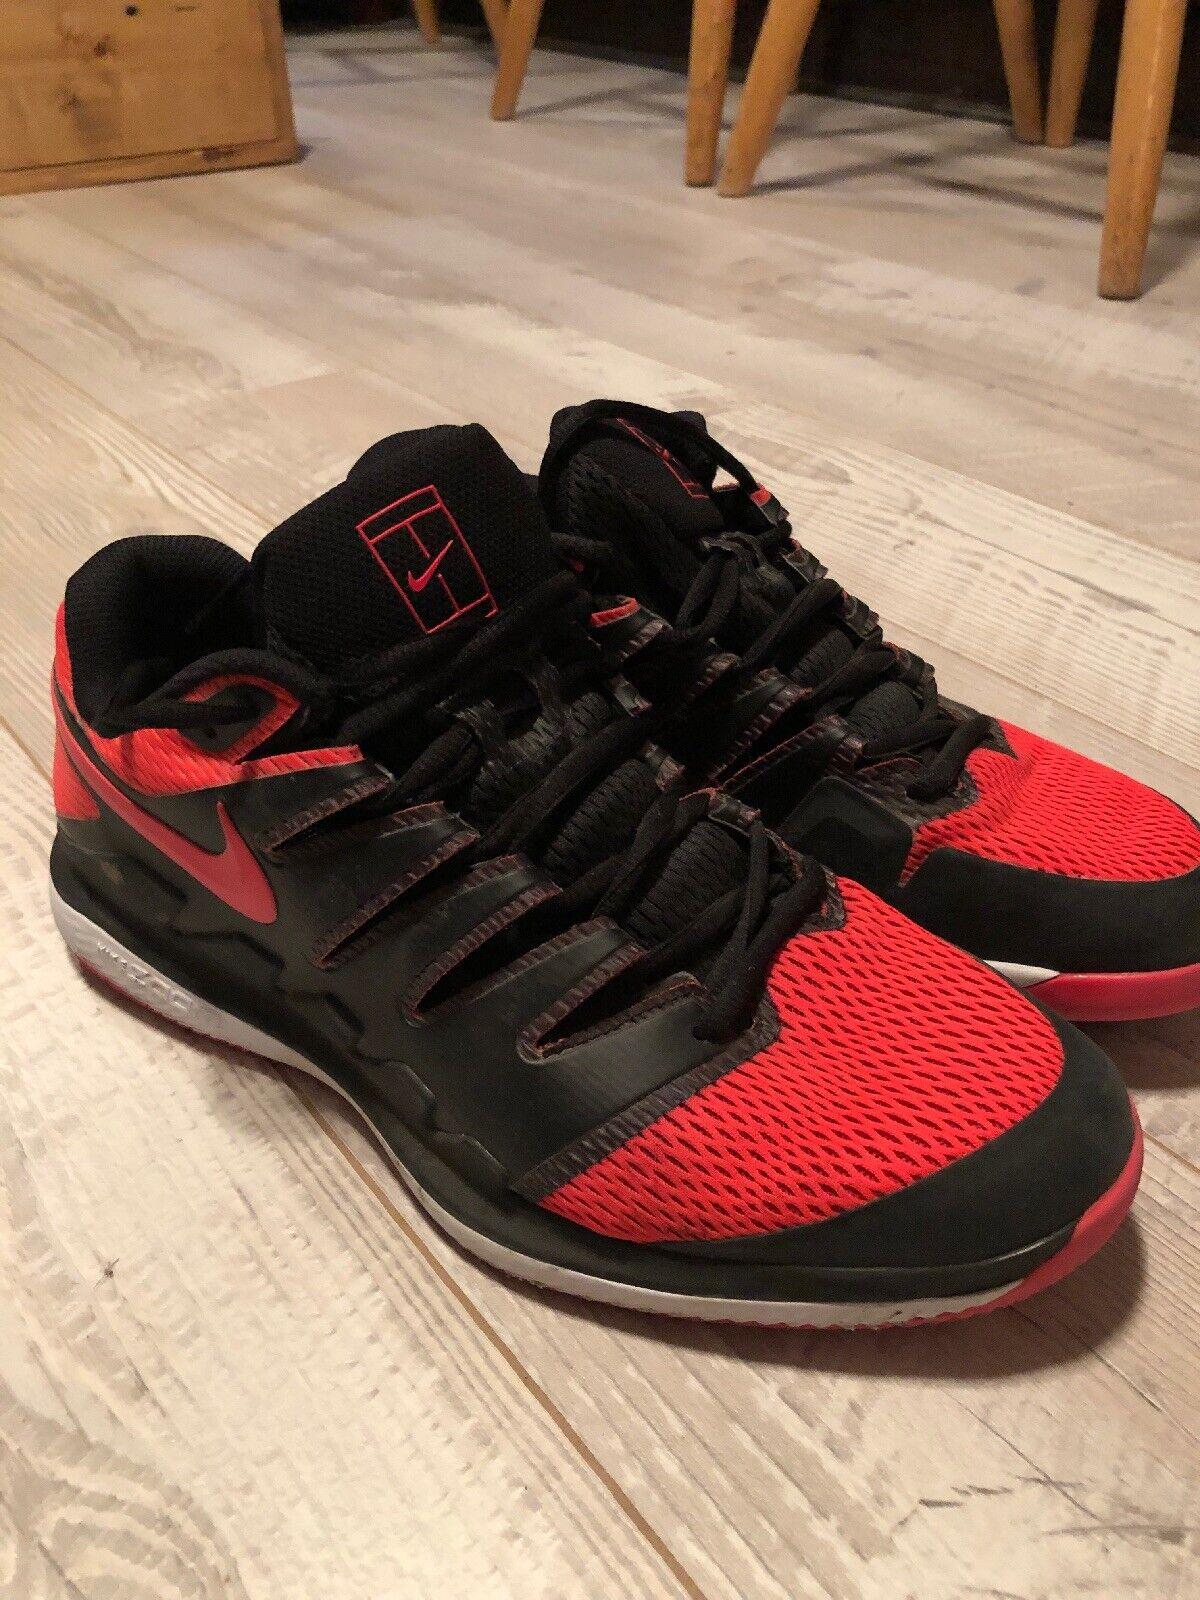 Nike Air Zoom Vapor X HC Size 10.5